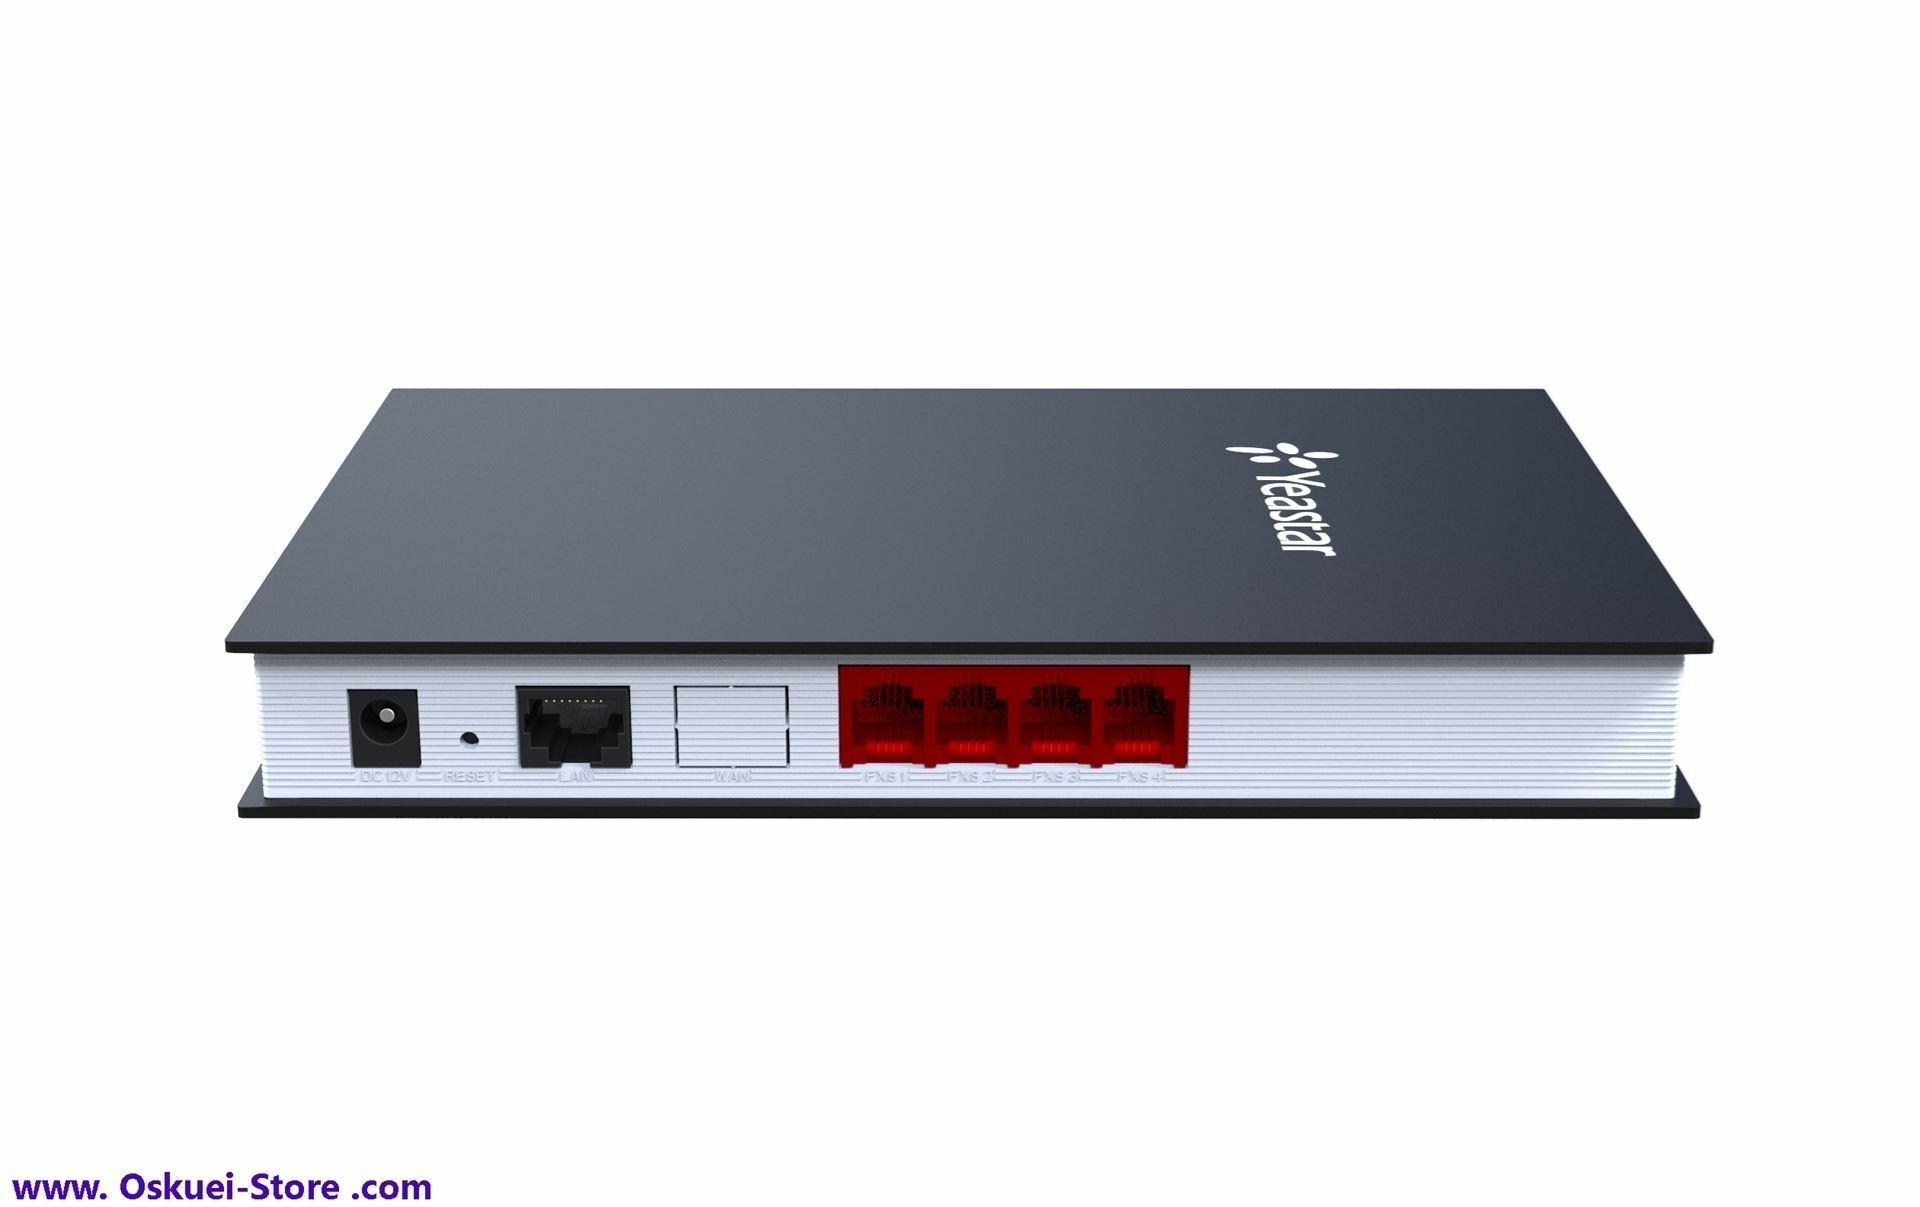 Yeastar TA410 FXO Gateway